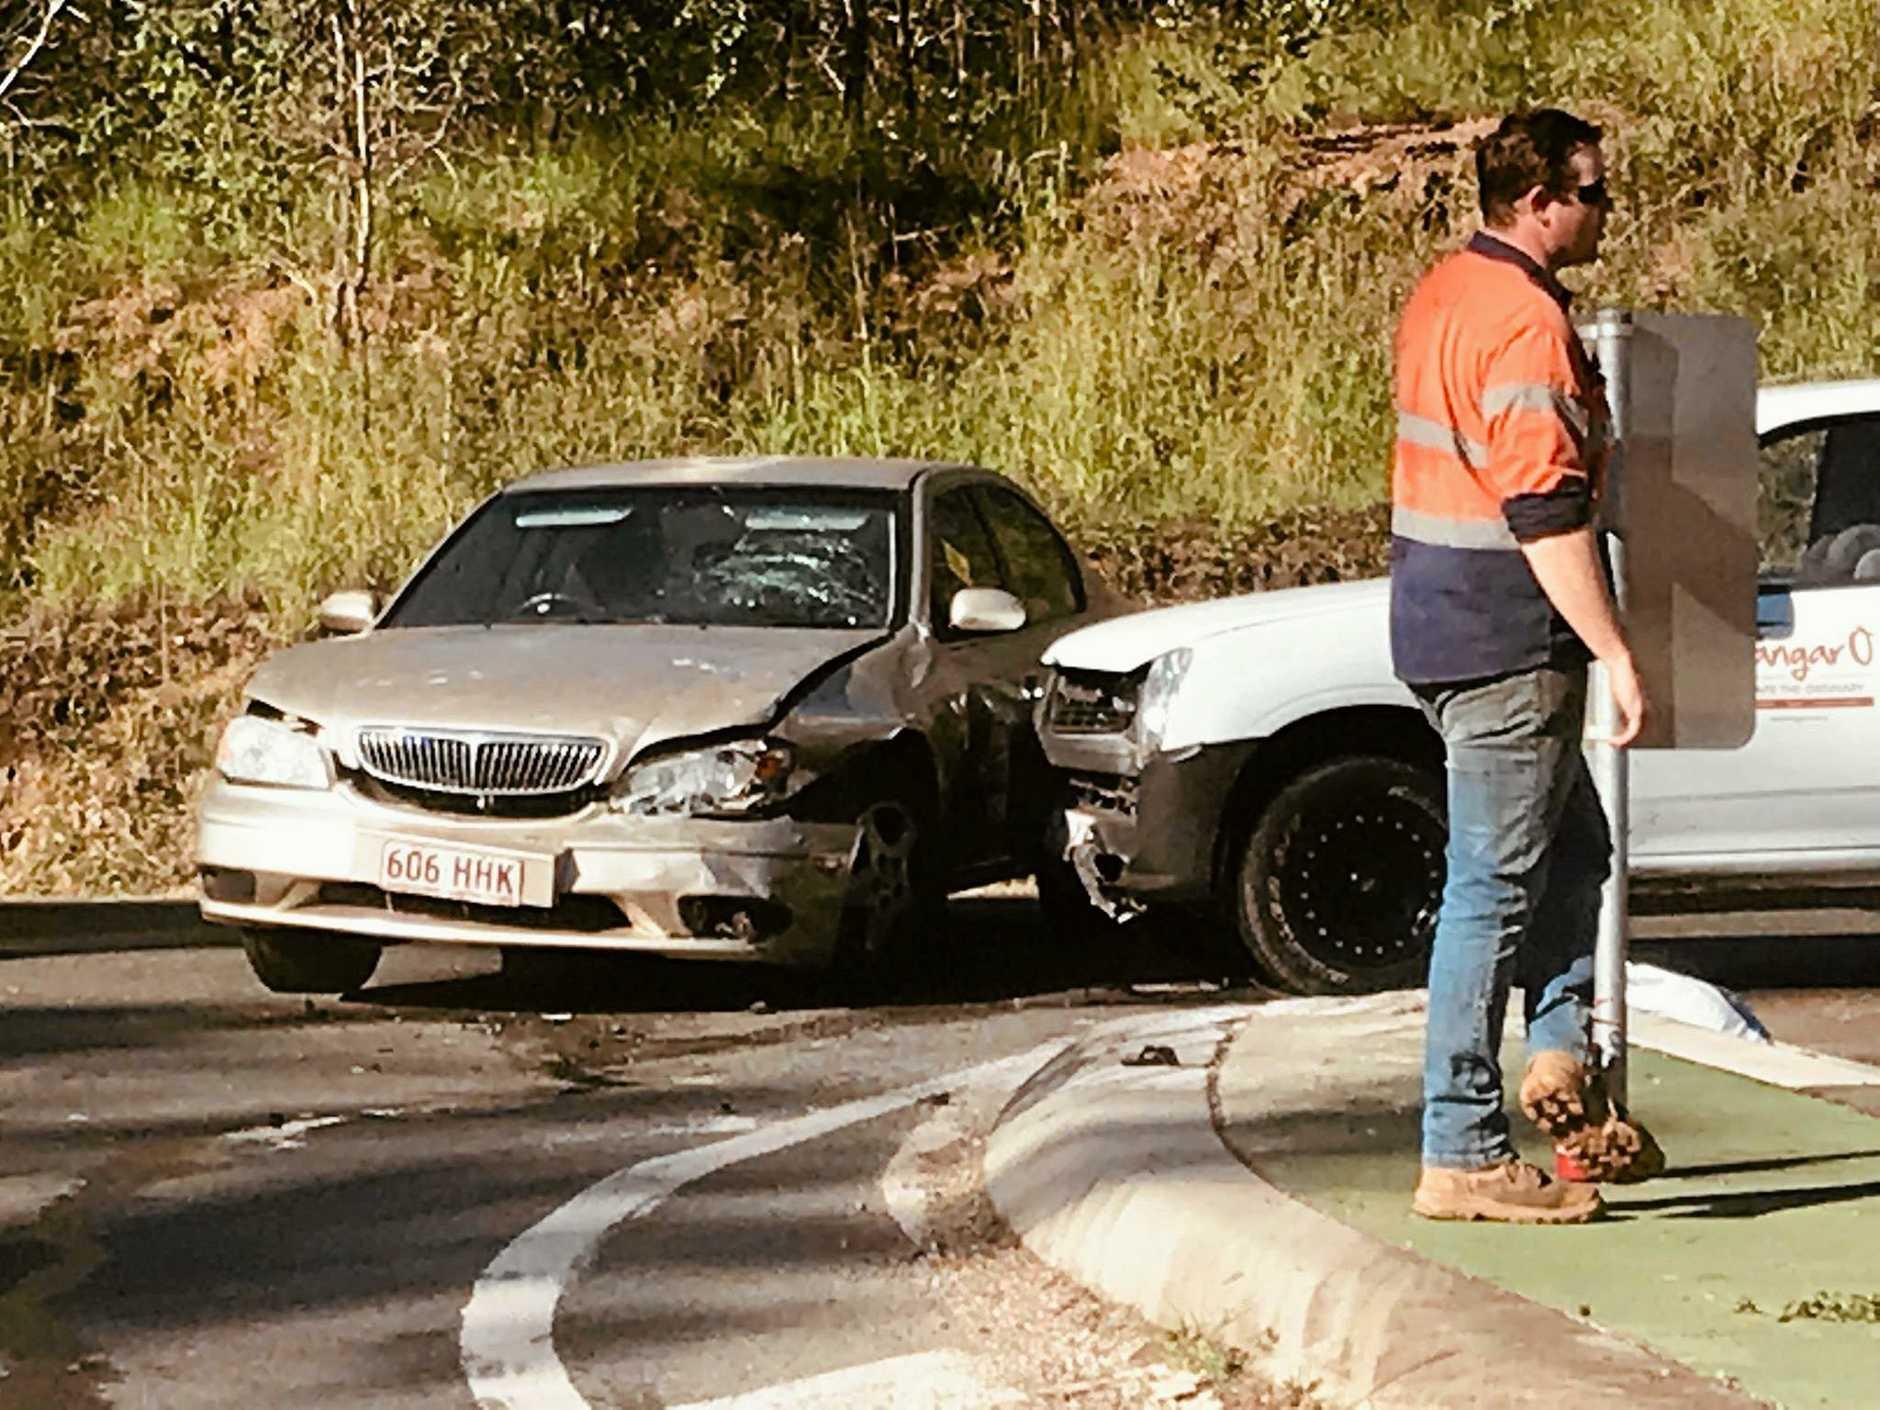 Crash at Bells Bridge Bruce HIghway intersection